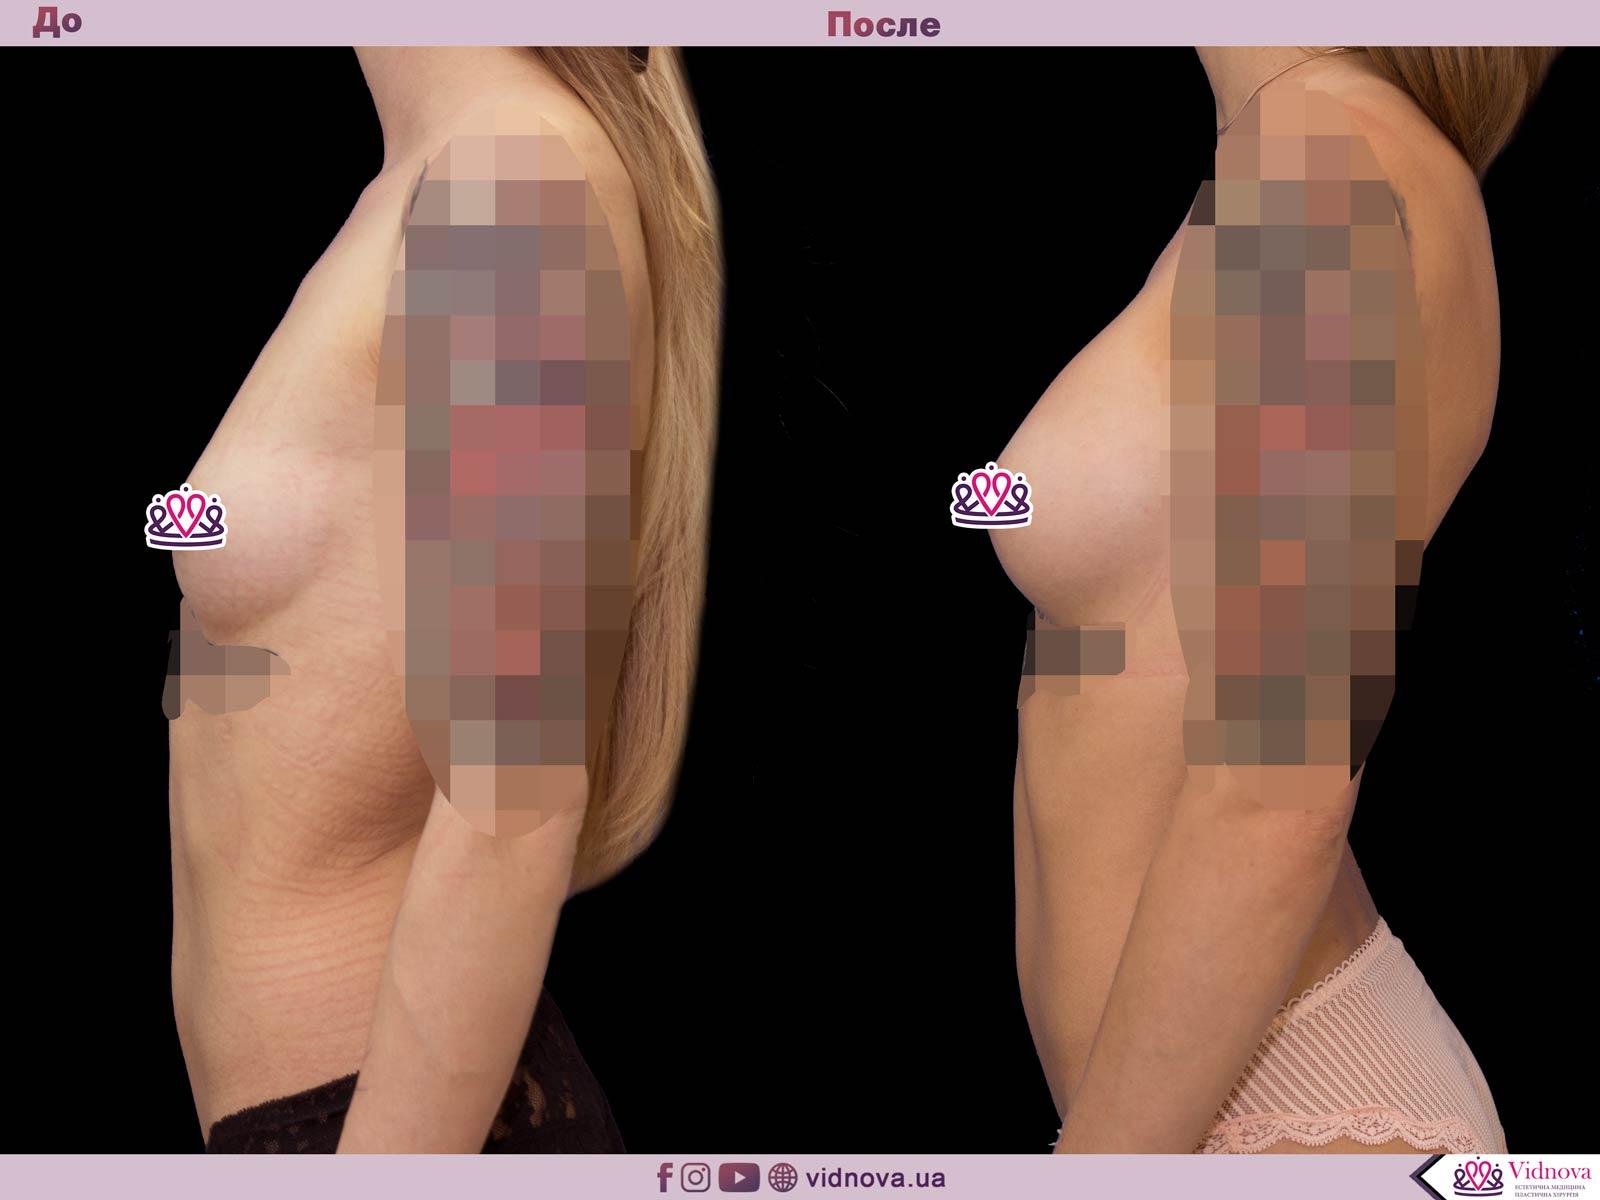 Увеличение груди: Фото ДО и ПОСЛЕ - Пример №37-3 - Клиника Vidnova